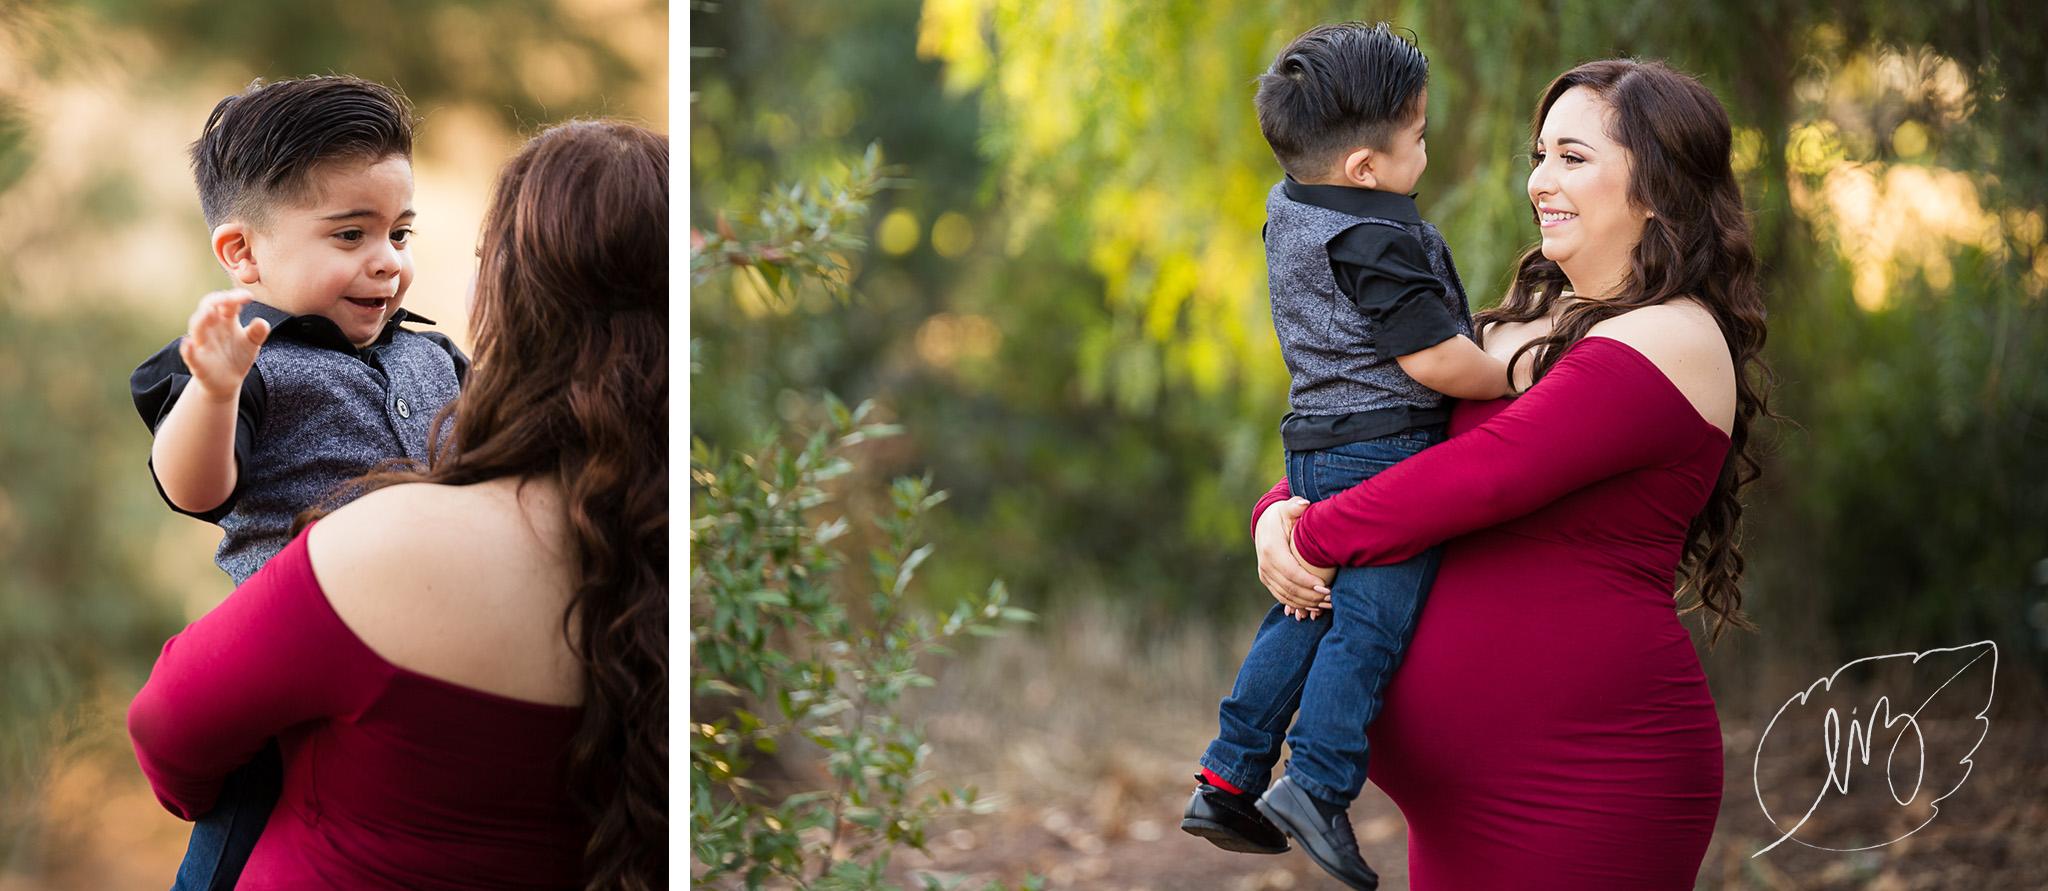 Inland-Empire-Maternity-Photography (4).jpg